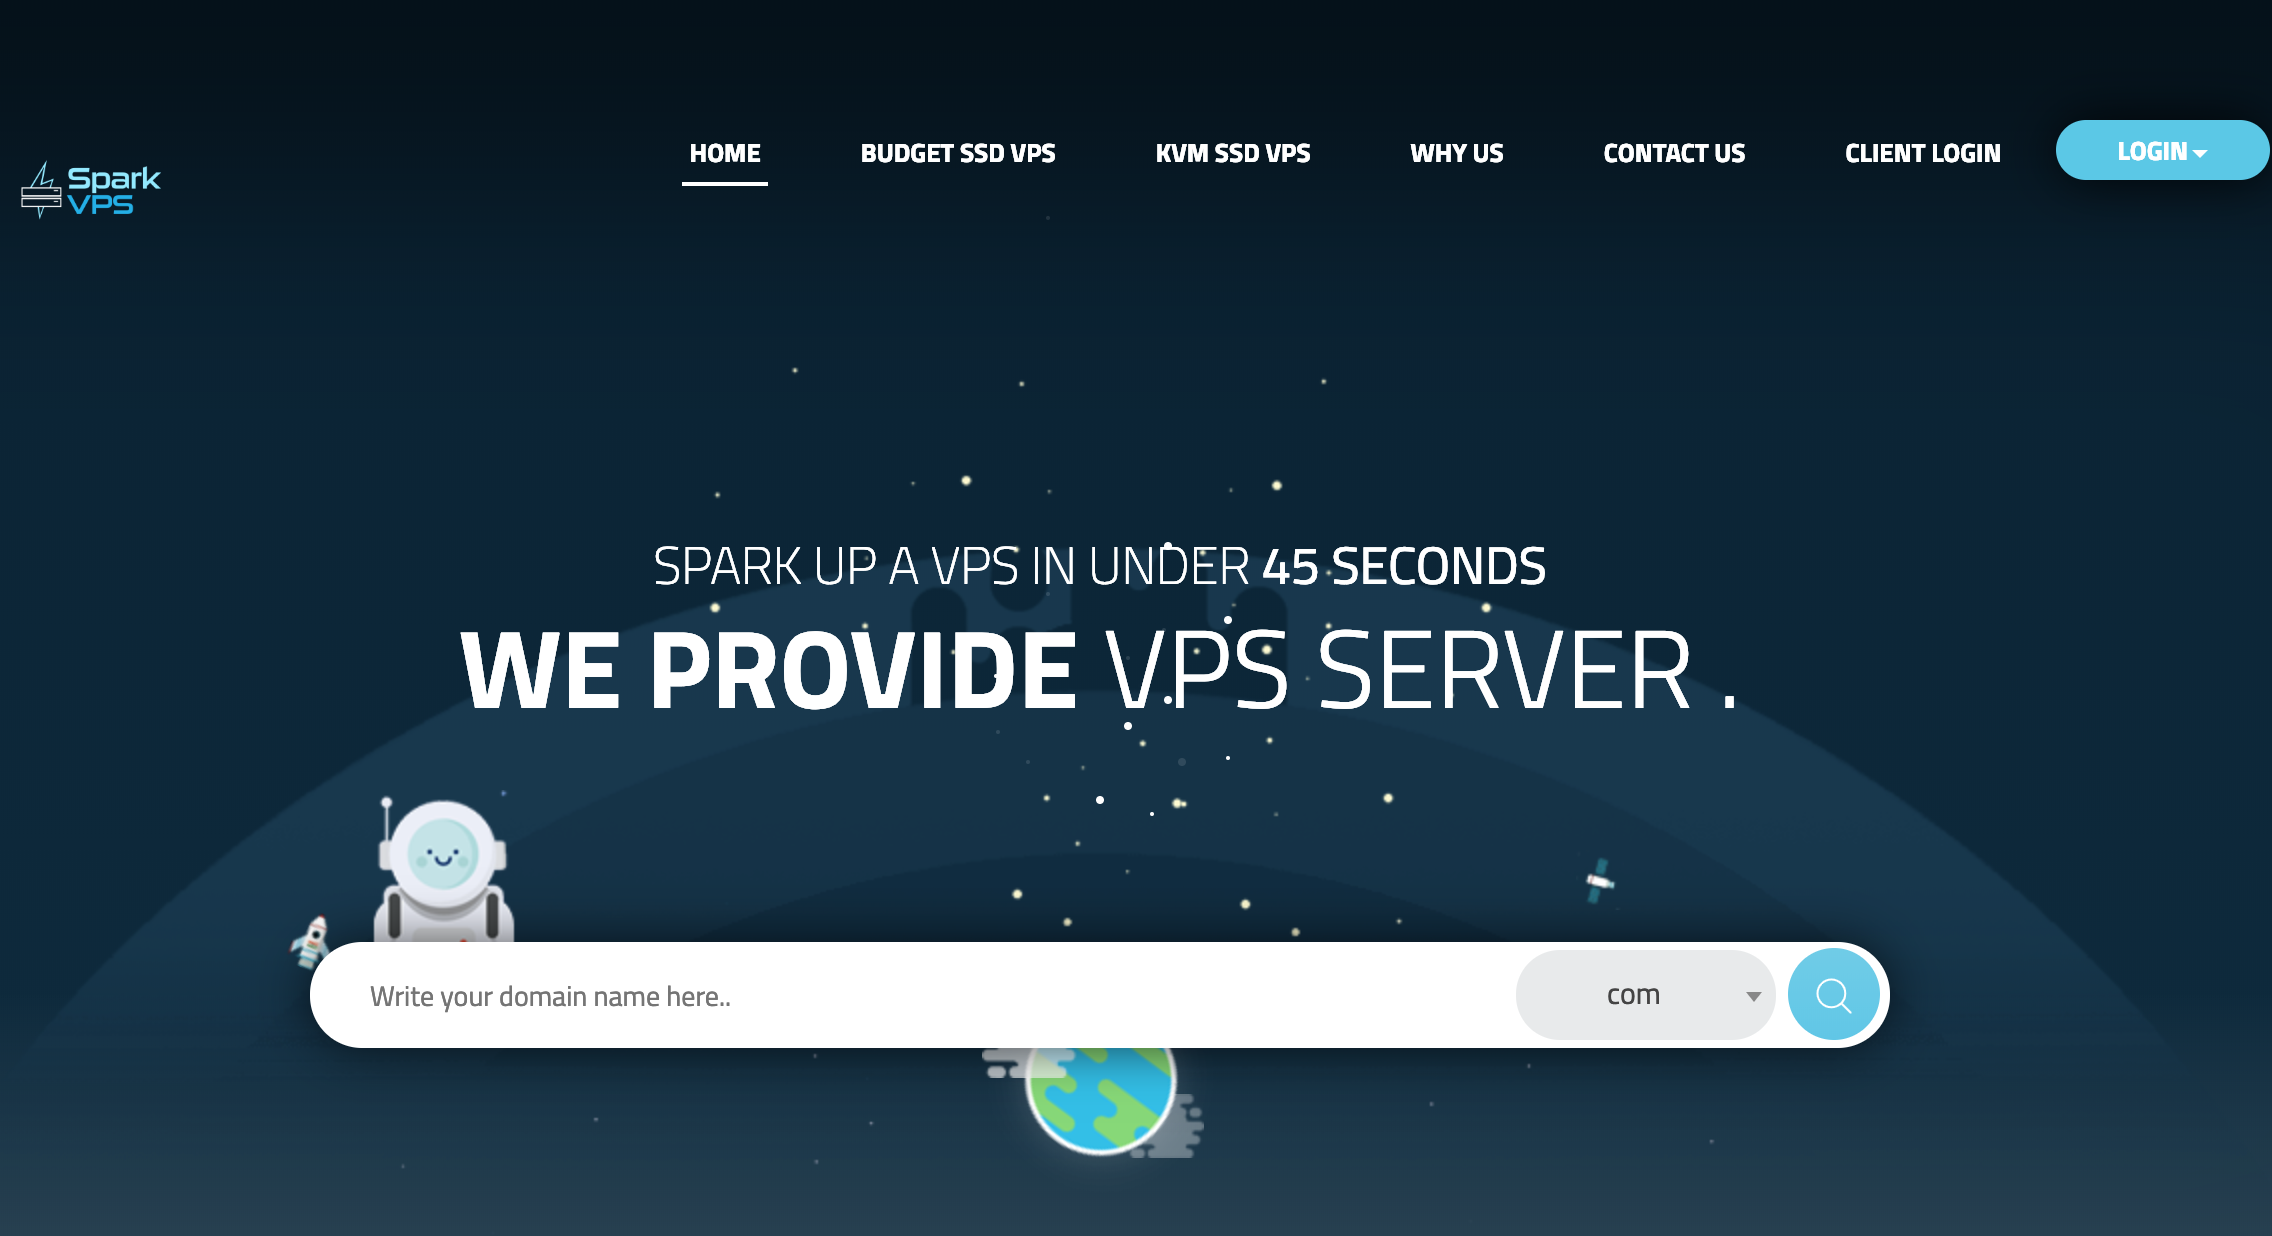 SparkVPS KVM虚拟化年付25美元起,可自定义操作系统、自定义内核,SparkVPS优惠码